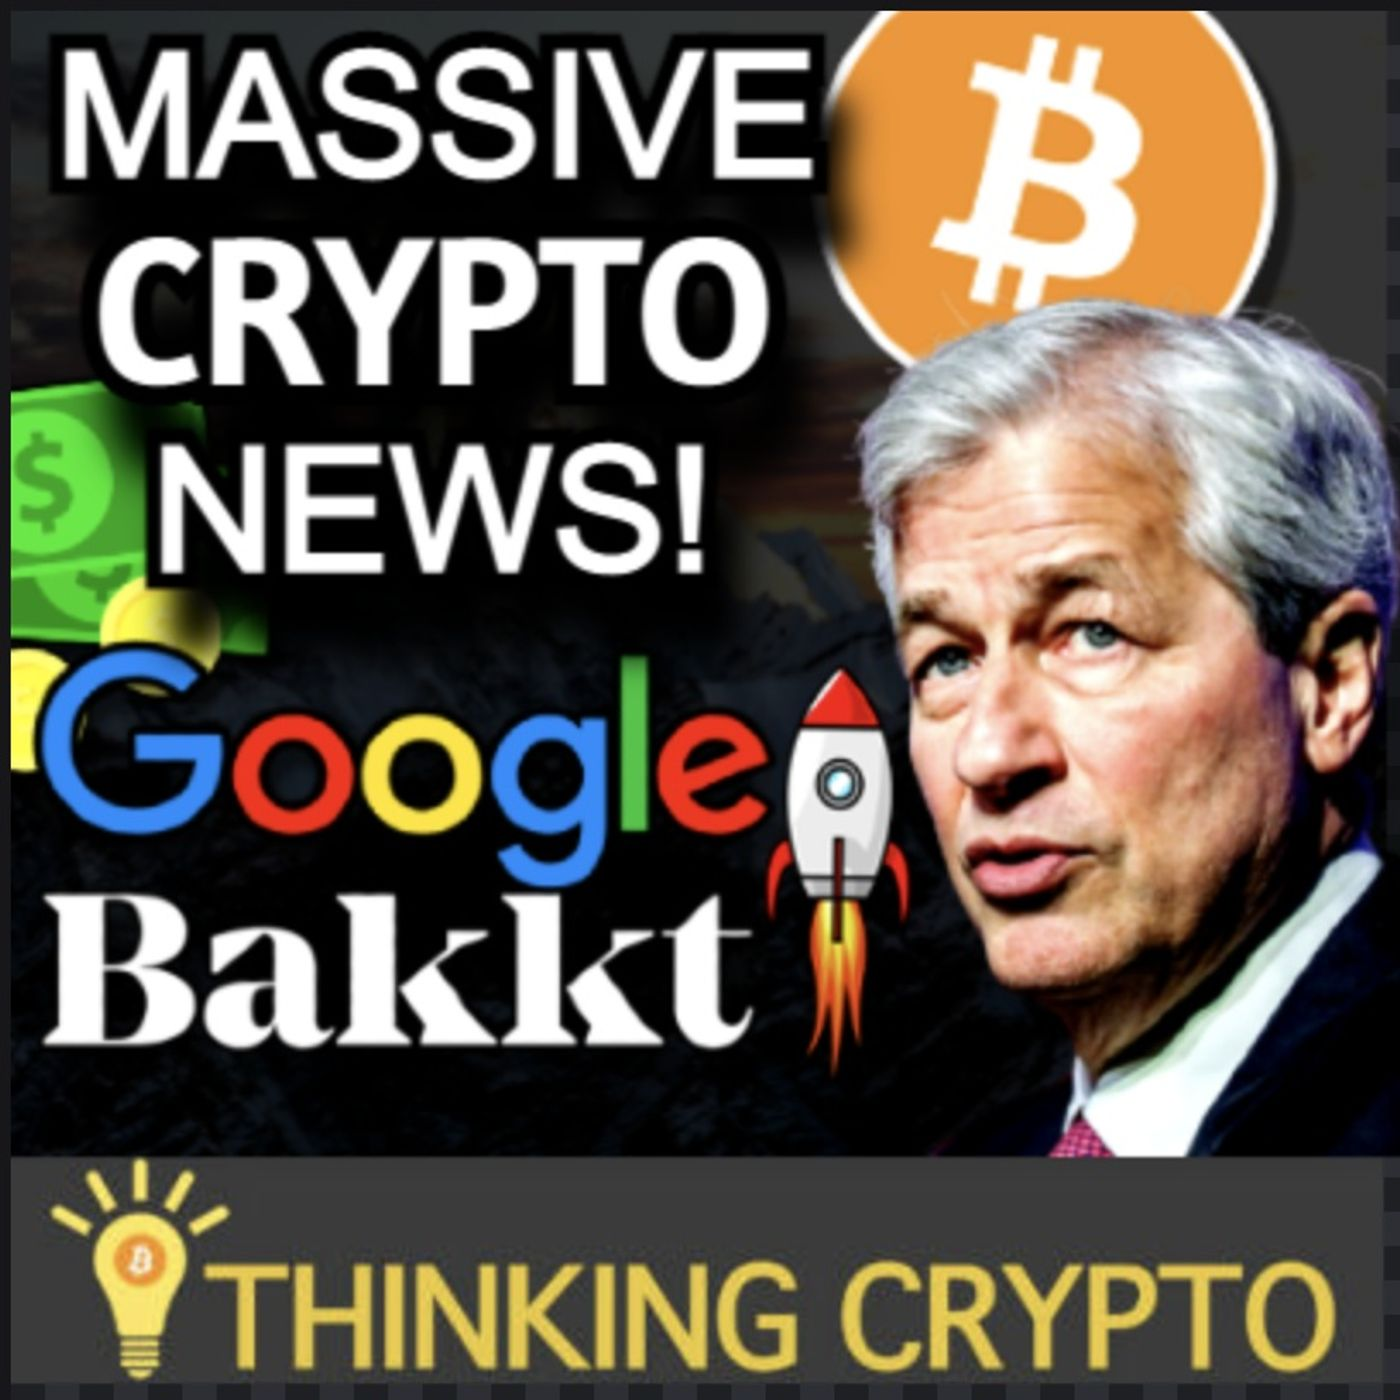 Google To Accept CRYPTO Via Bakkt - Ted Cruz Bitcoin Mining - Jamie Dimon Bitcoin FUD